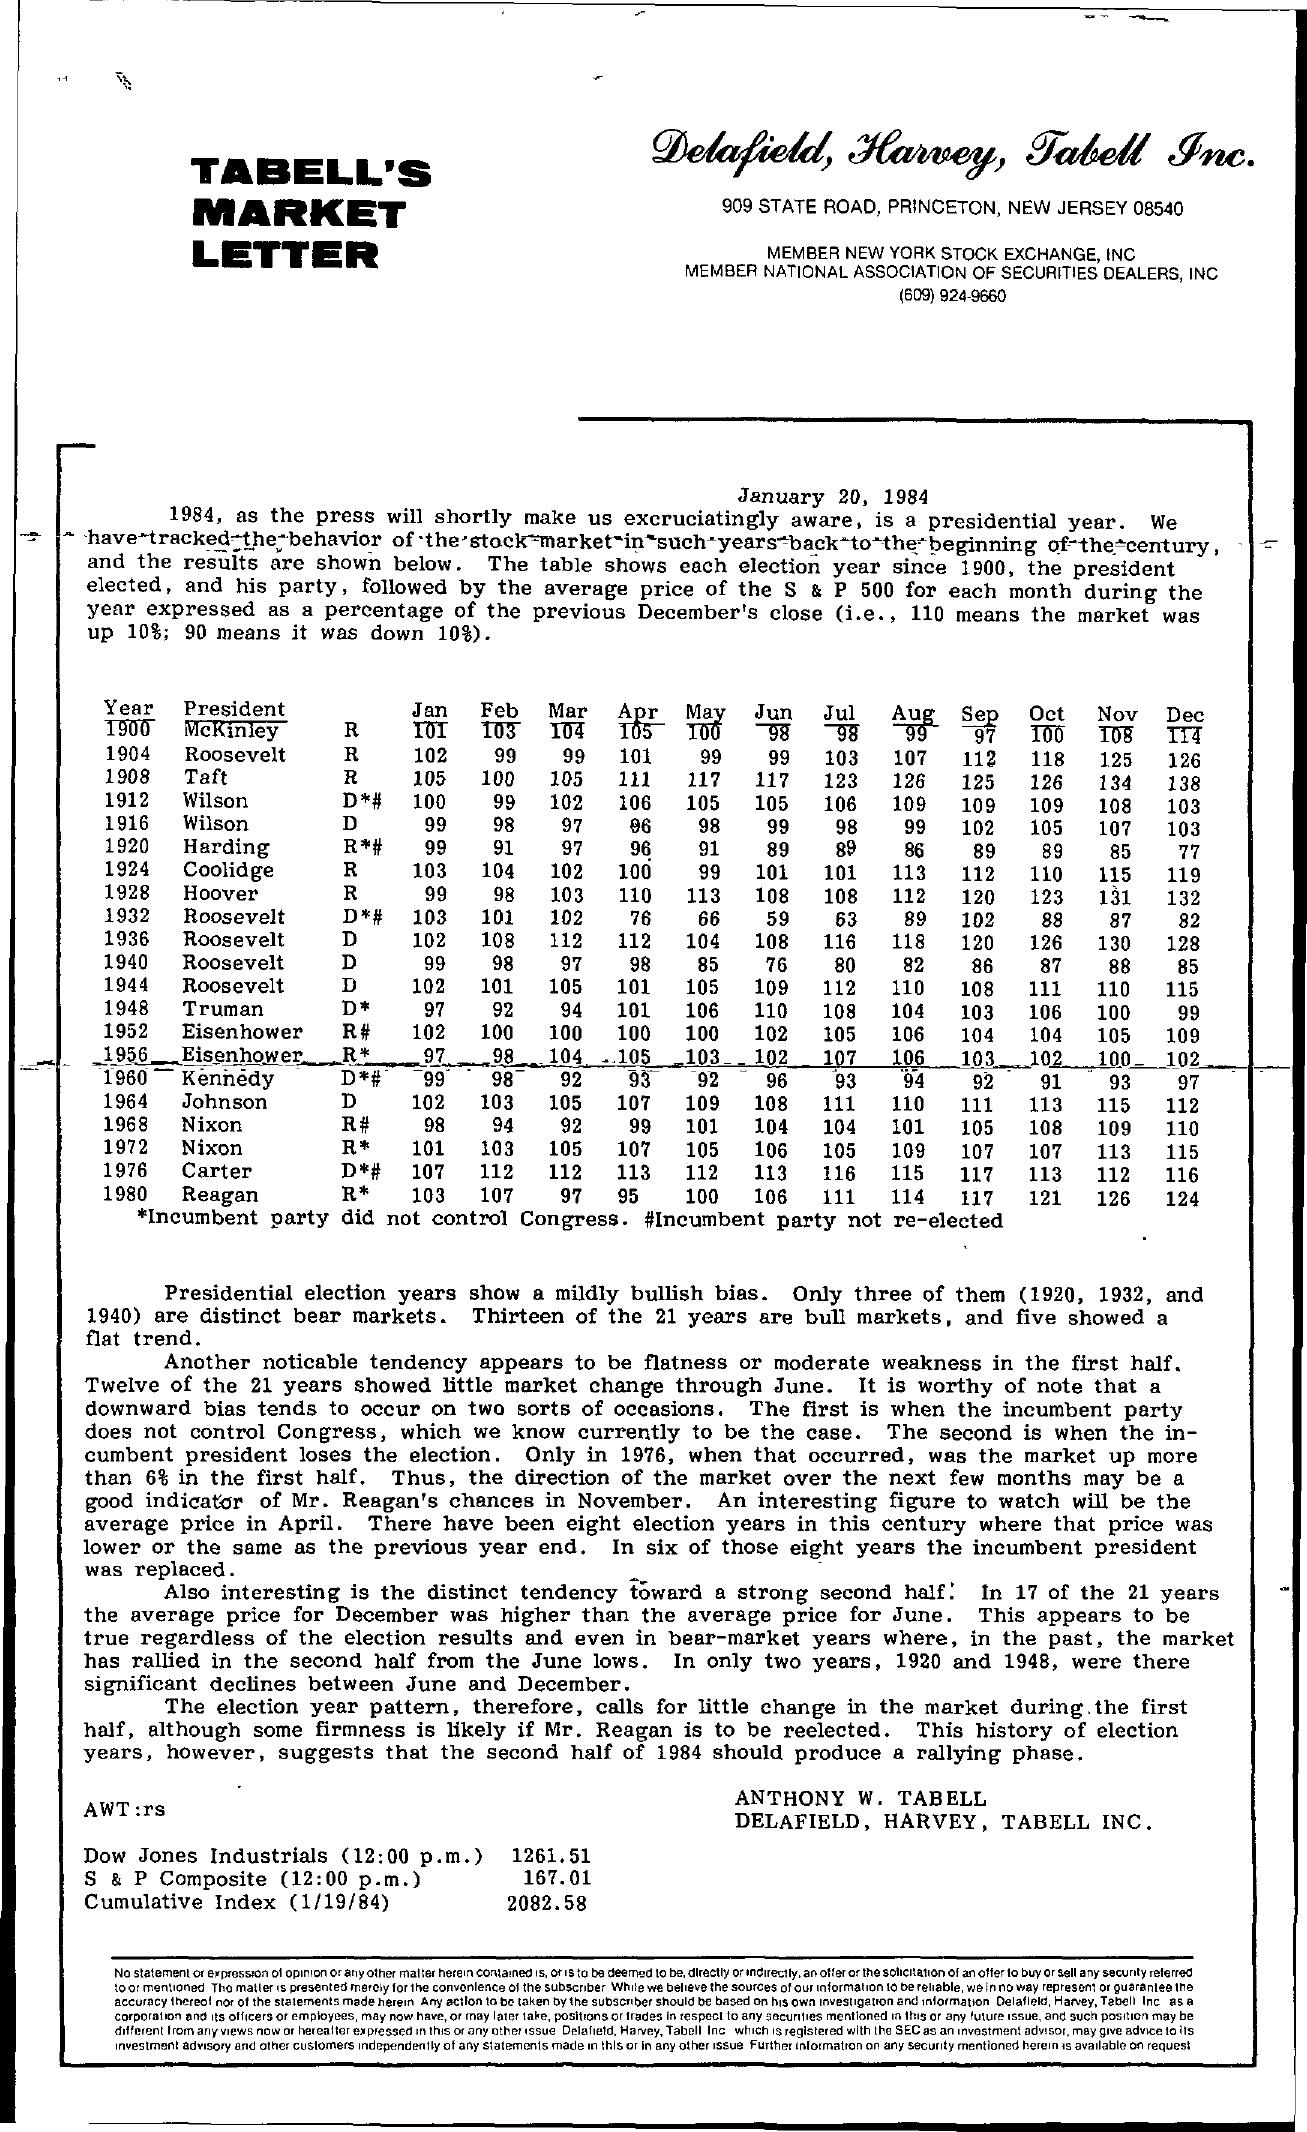 Tabell's Market Letter - January 20, 1984